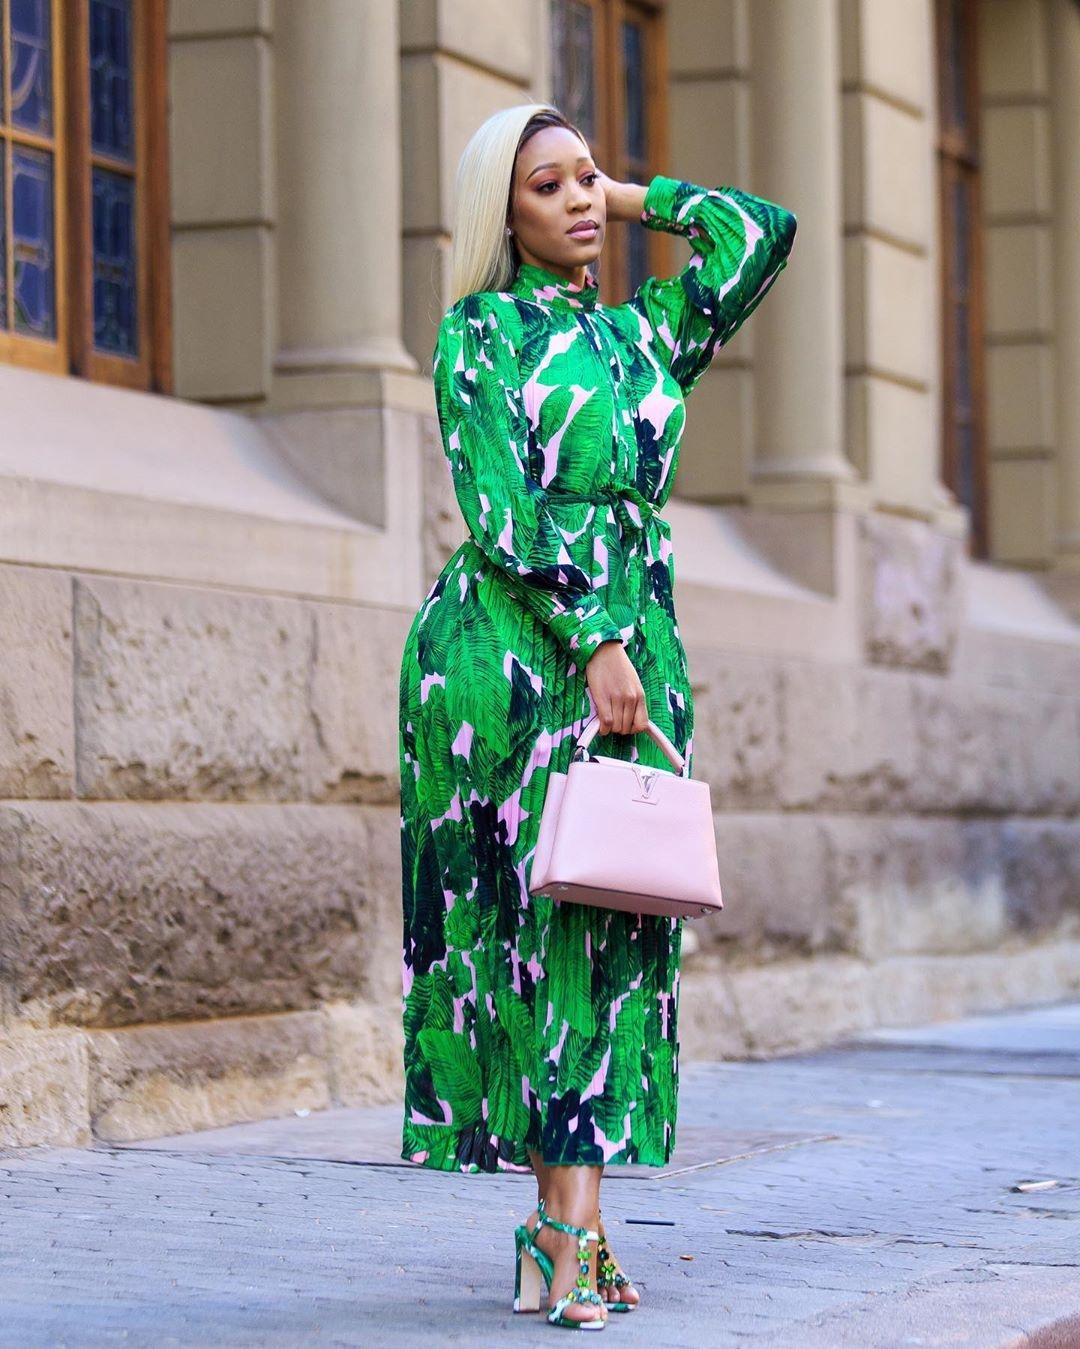 buhle-samuels-floral-dress